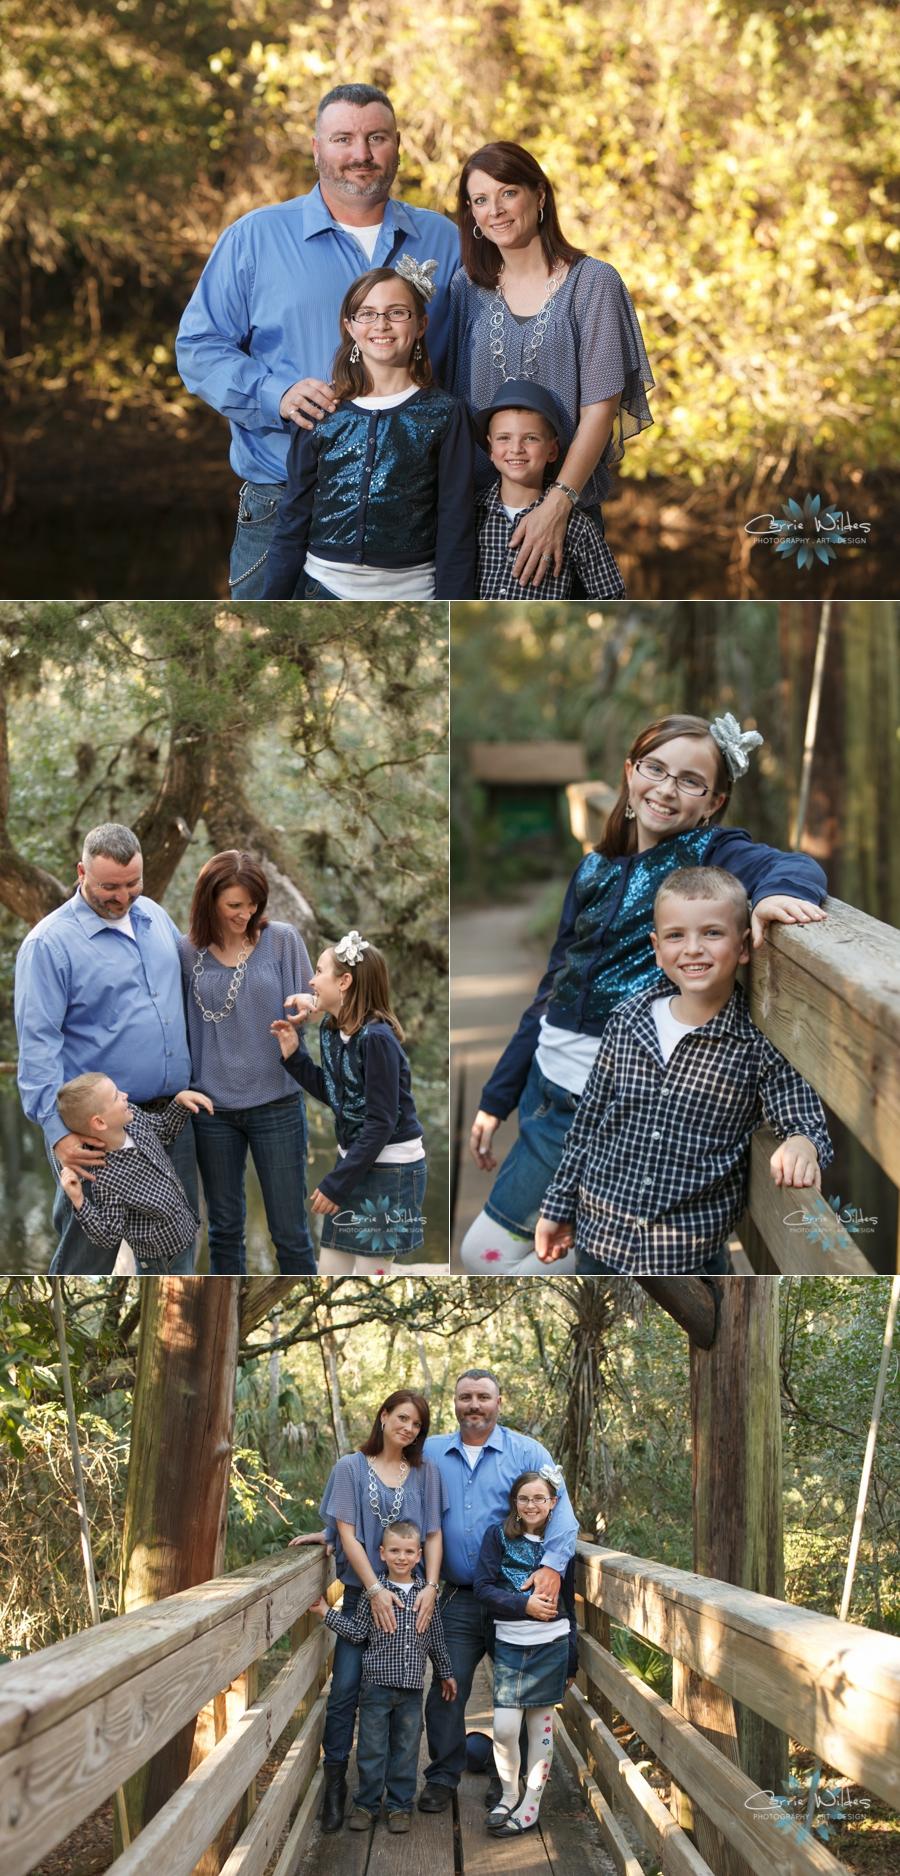 10_27_13 Tampa Family Portrait Session_0001.jpg